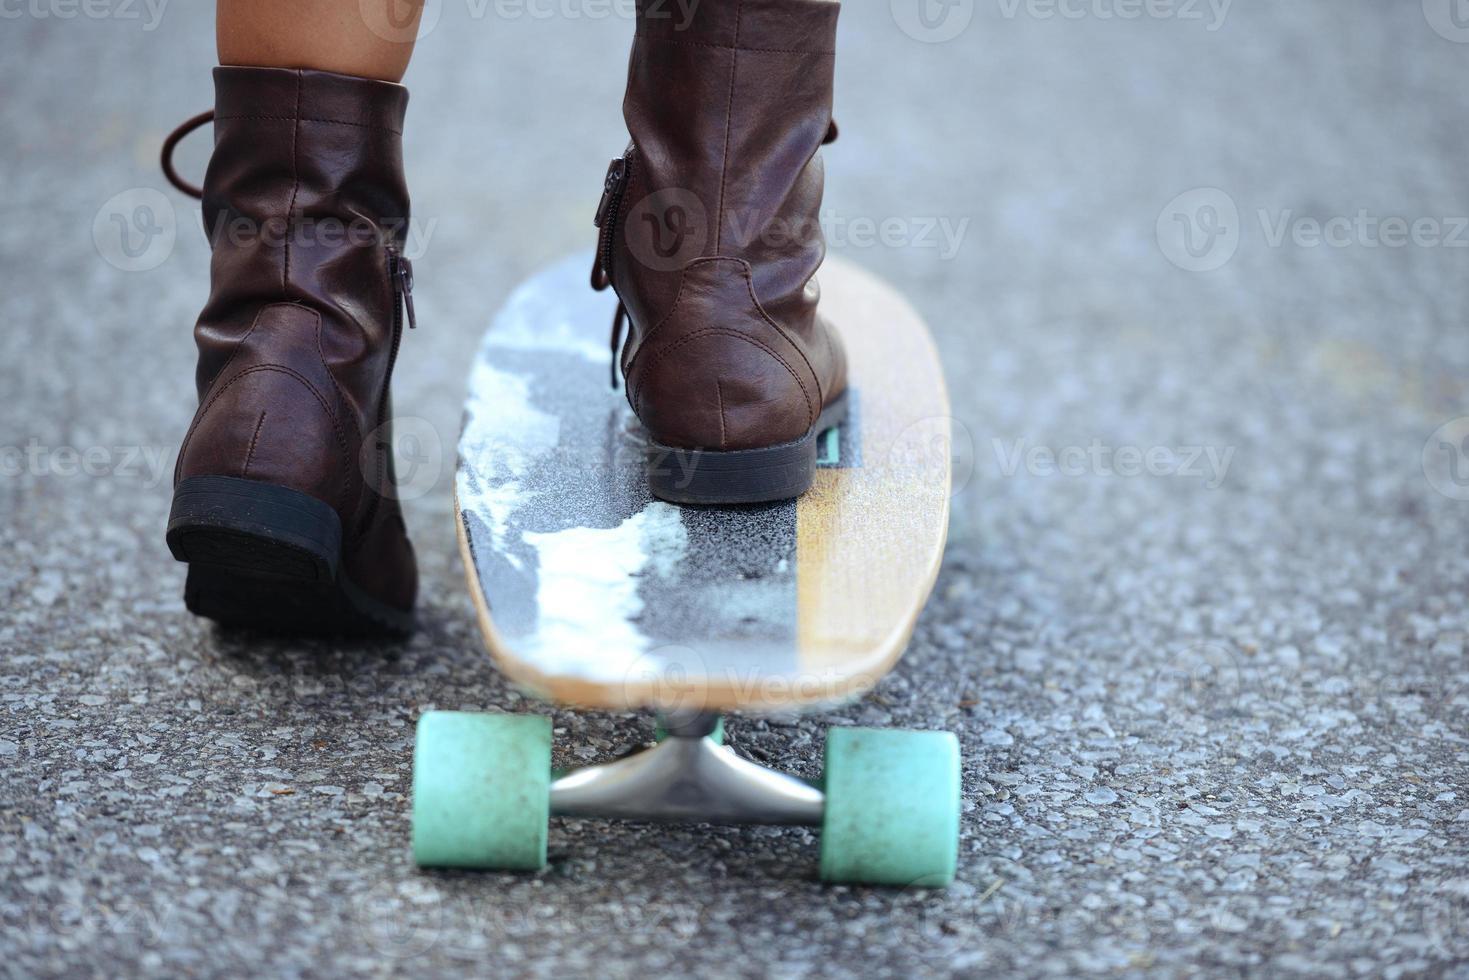 Nahaufnahme Füße auf Skateboard foto